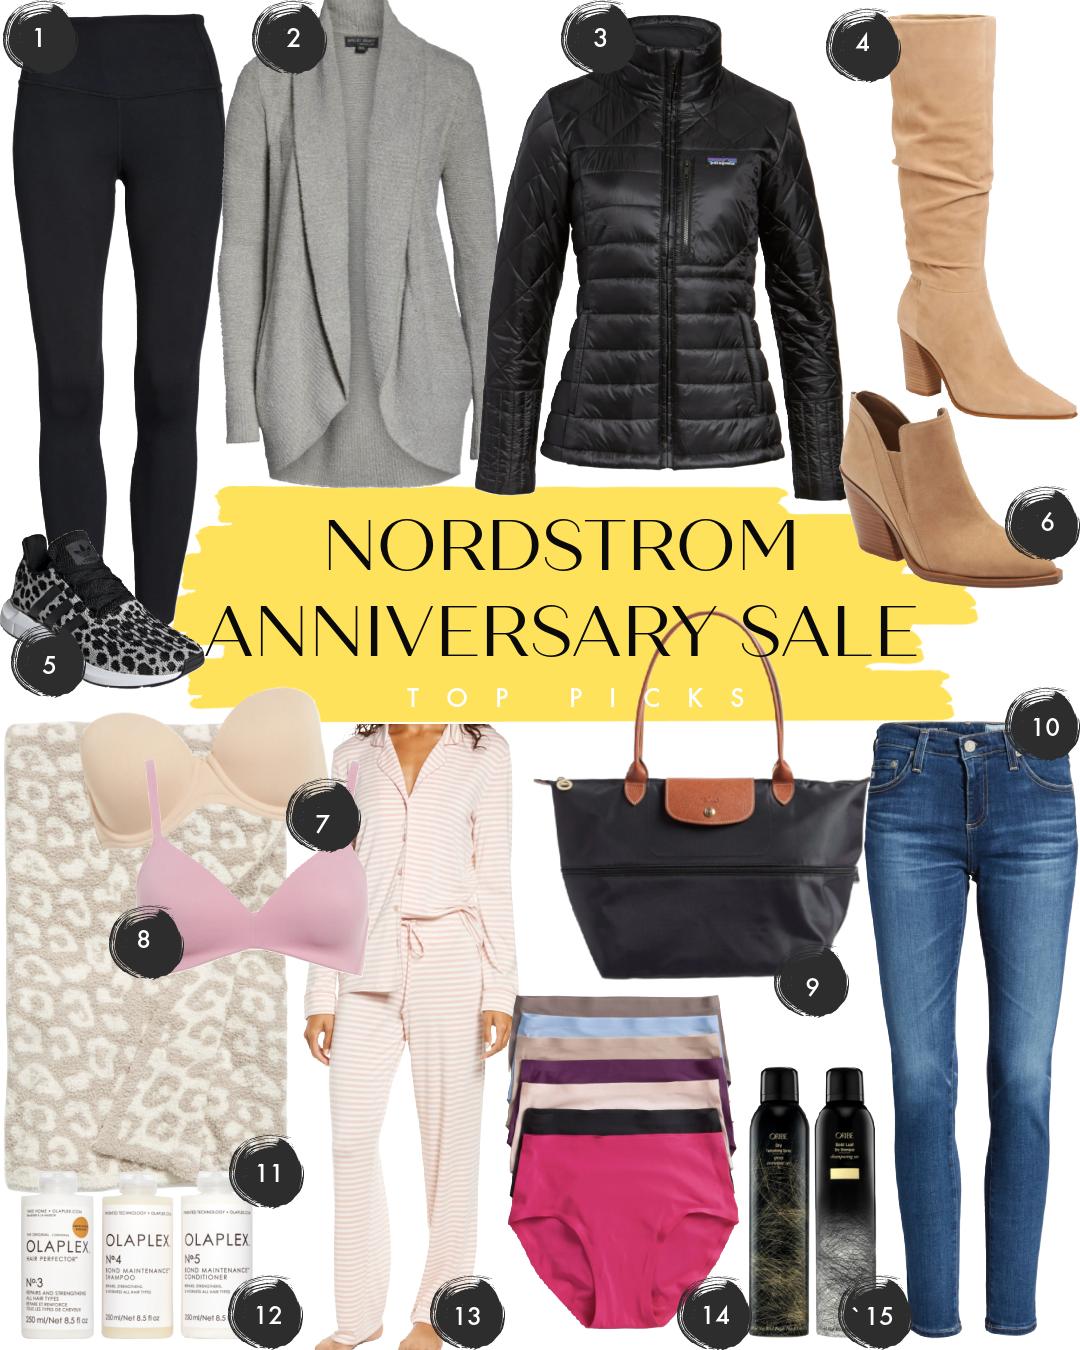 Nordstrom Anniversary Sale - Top Picks